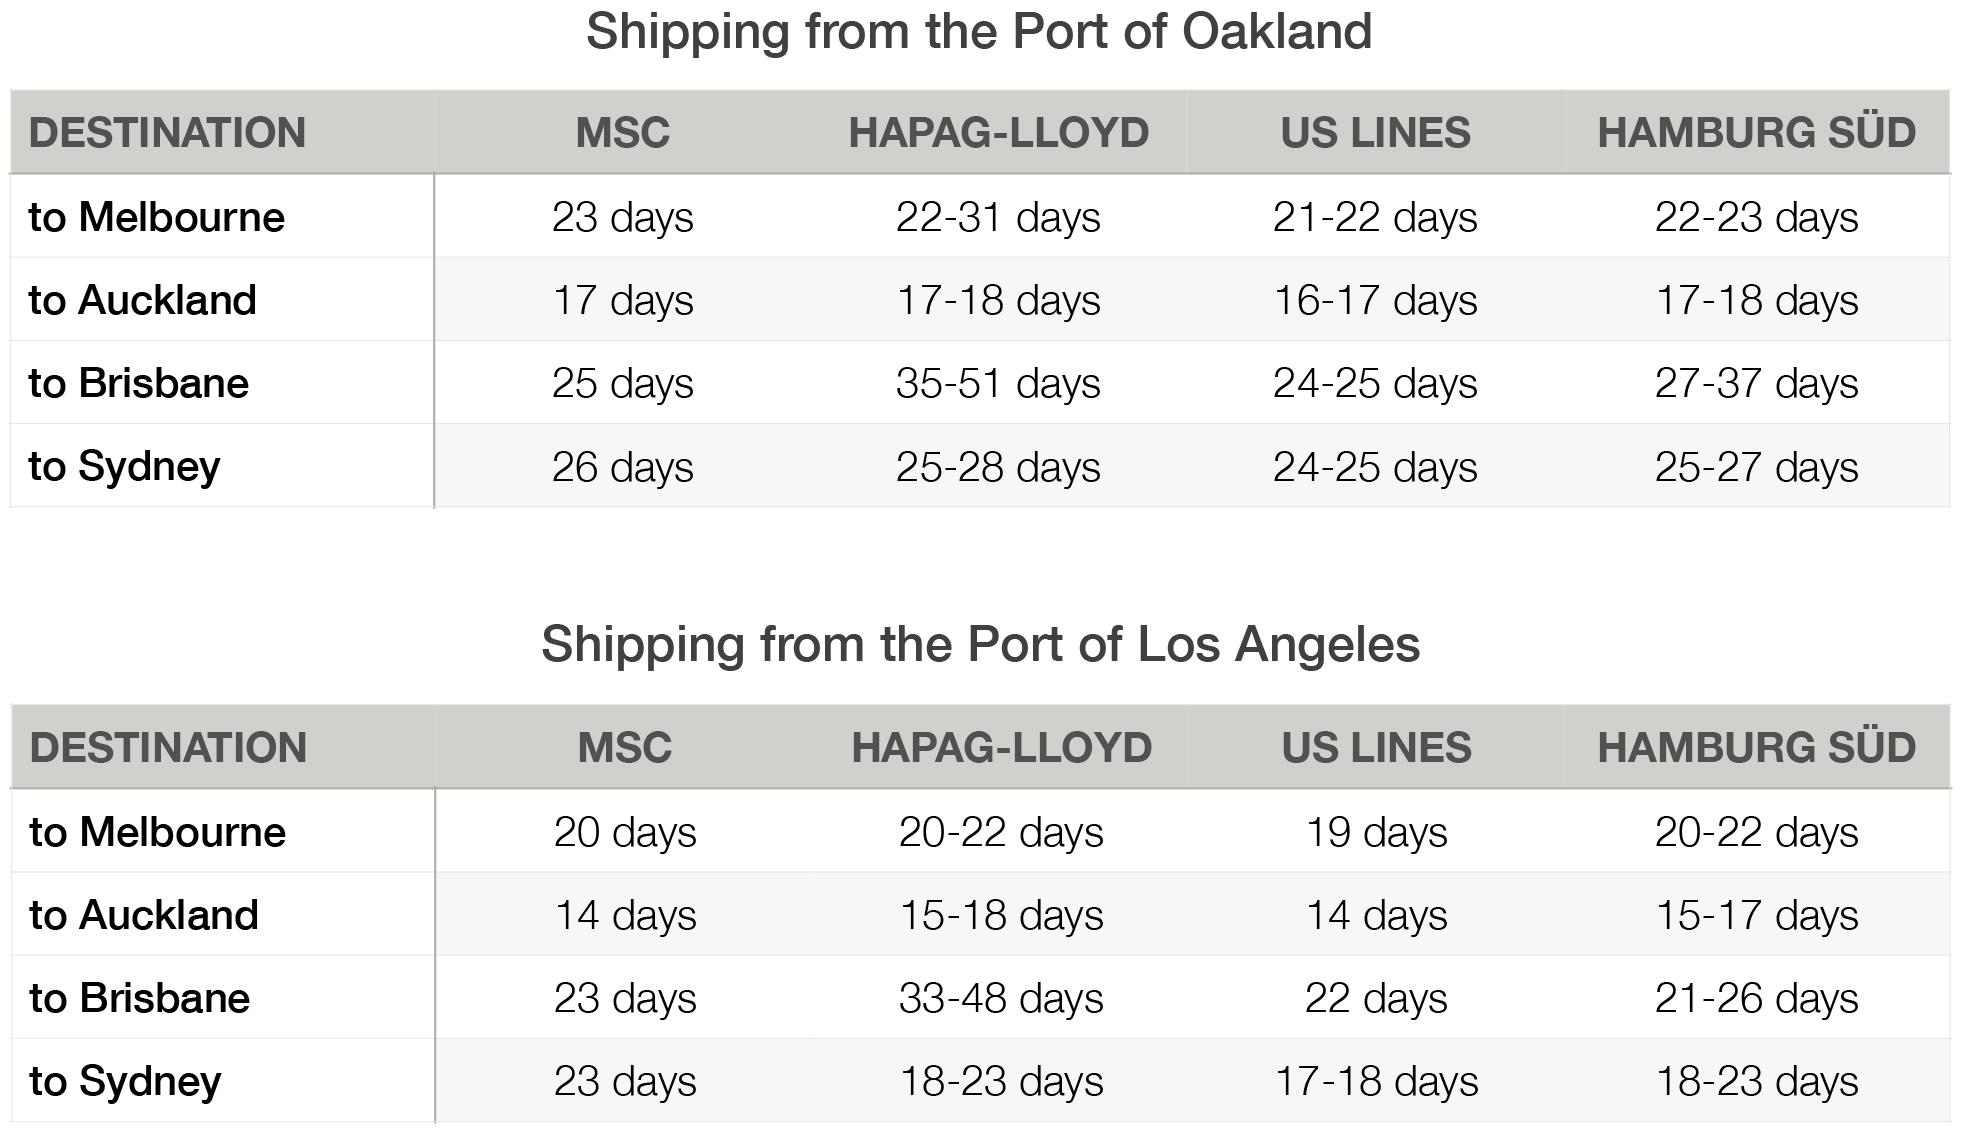 International Car Shipping Time to Australia